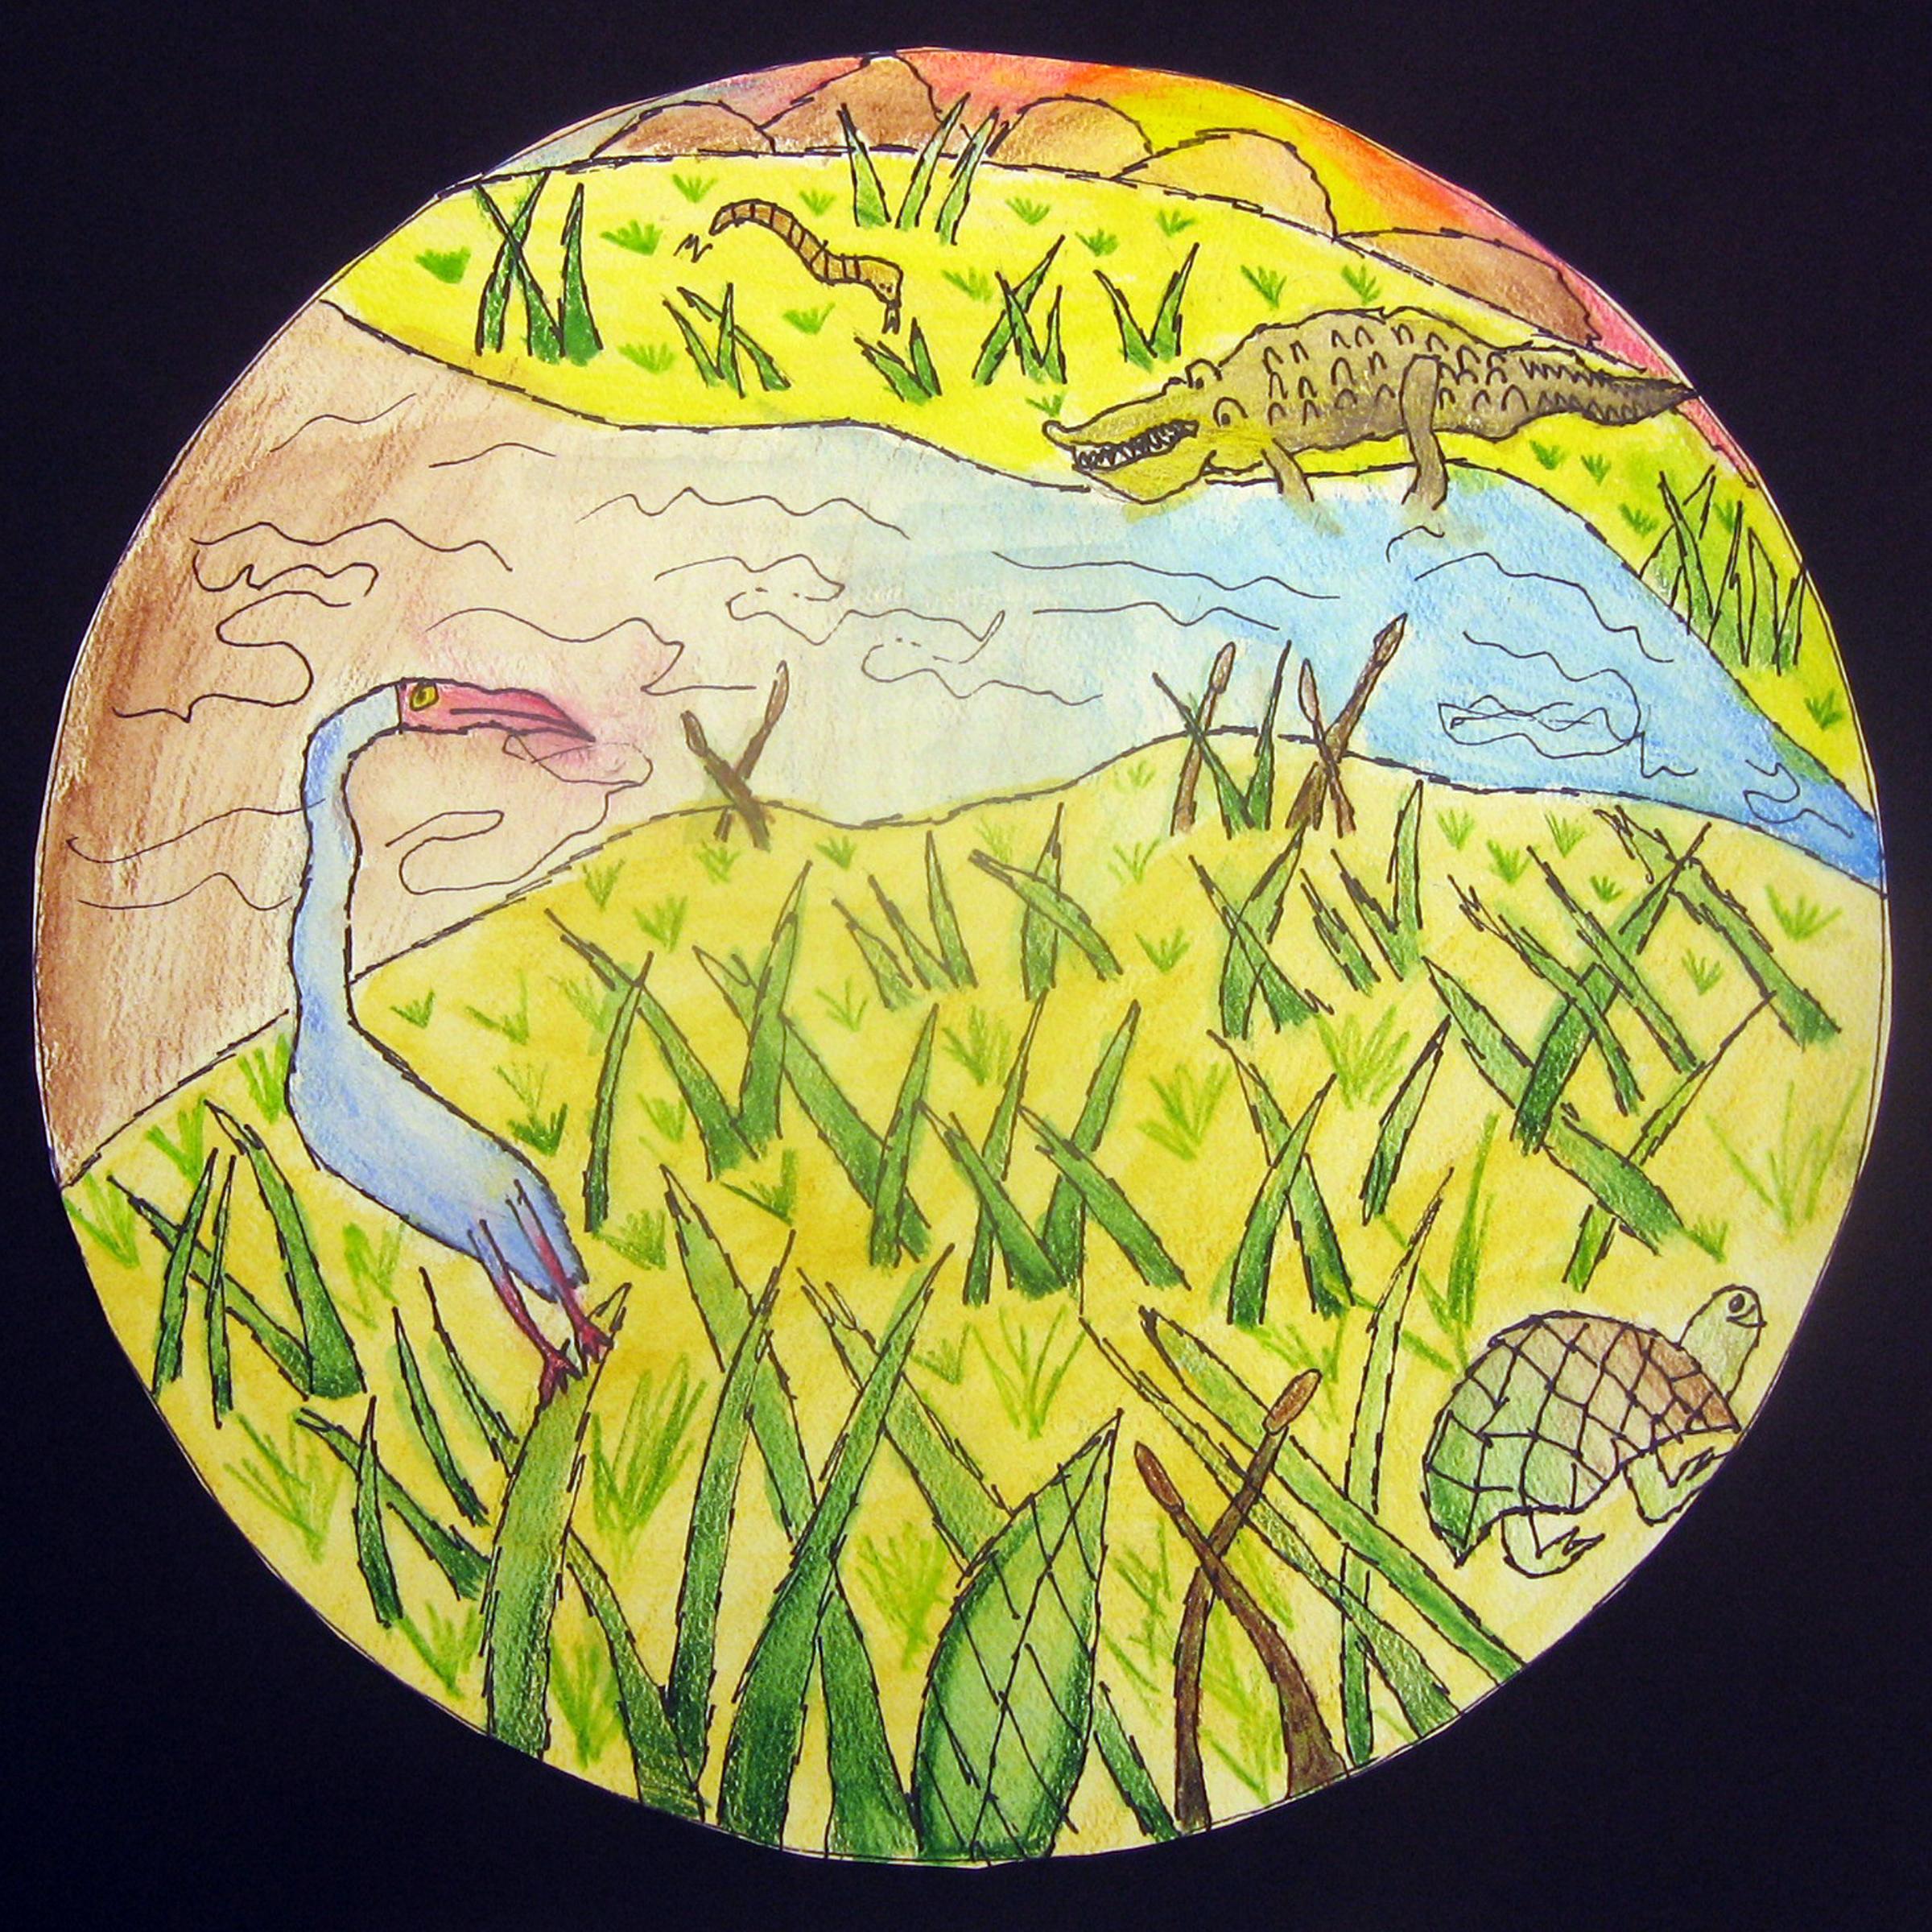 Biome Illustrations Ms Amslers Artroom